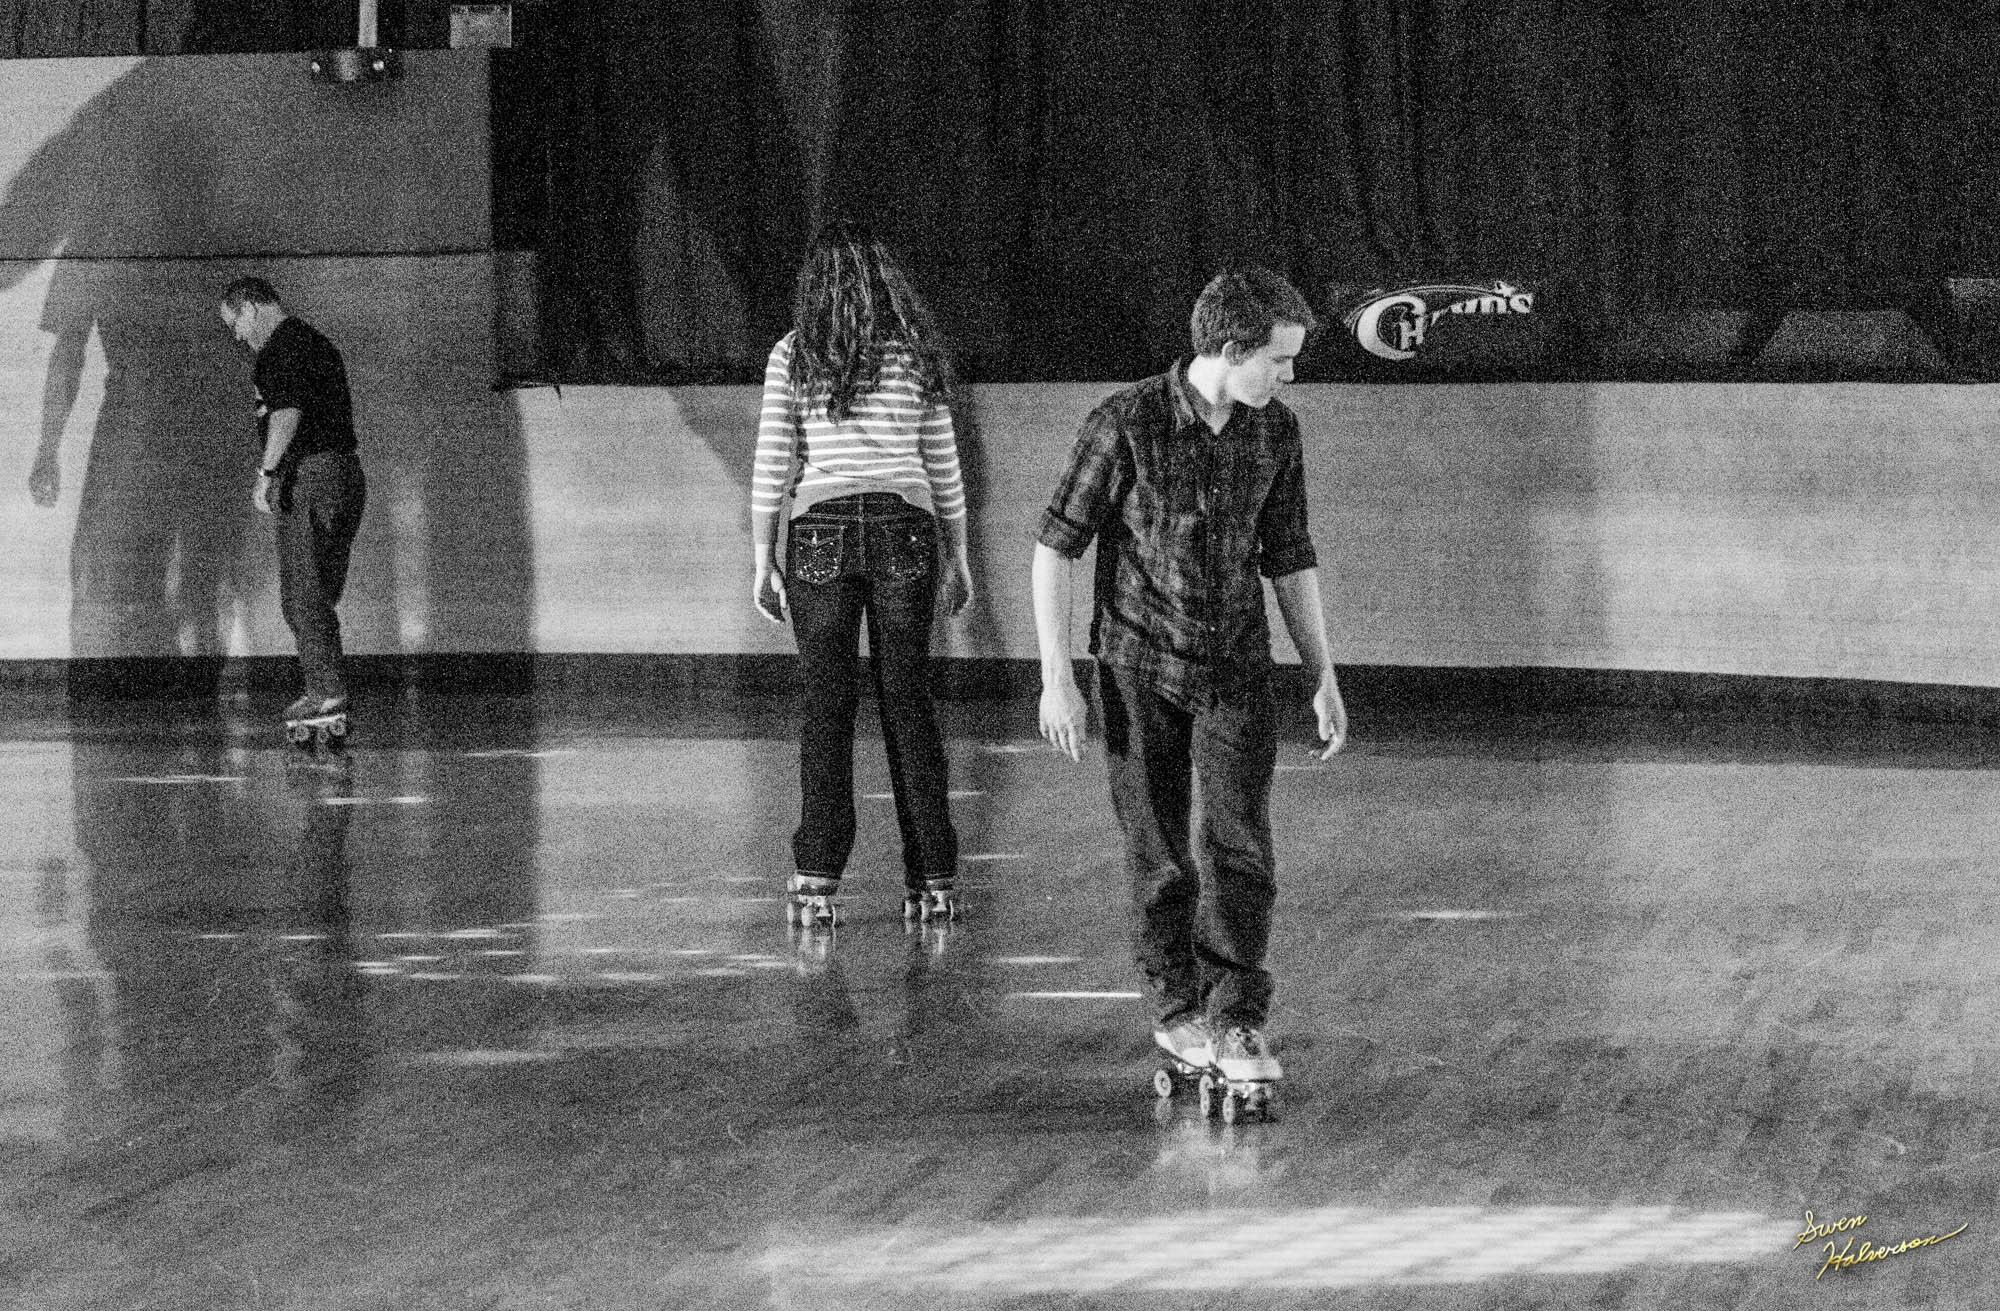 Theme:Skate| Title: Skating Backwards